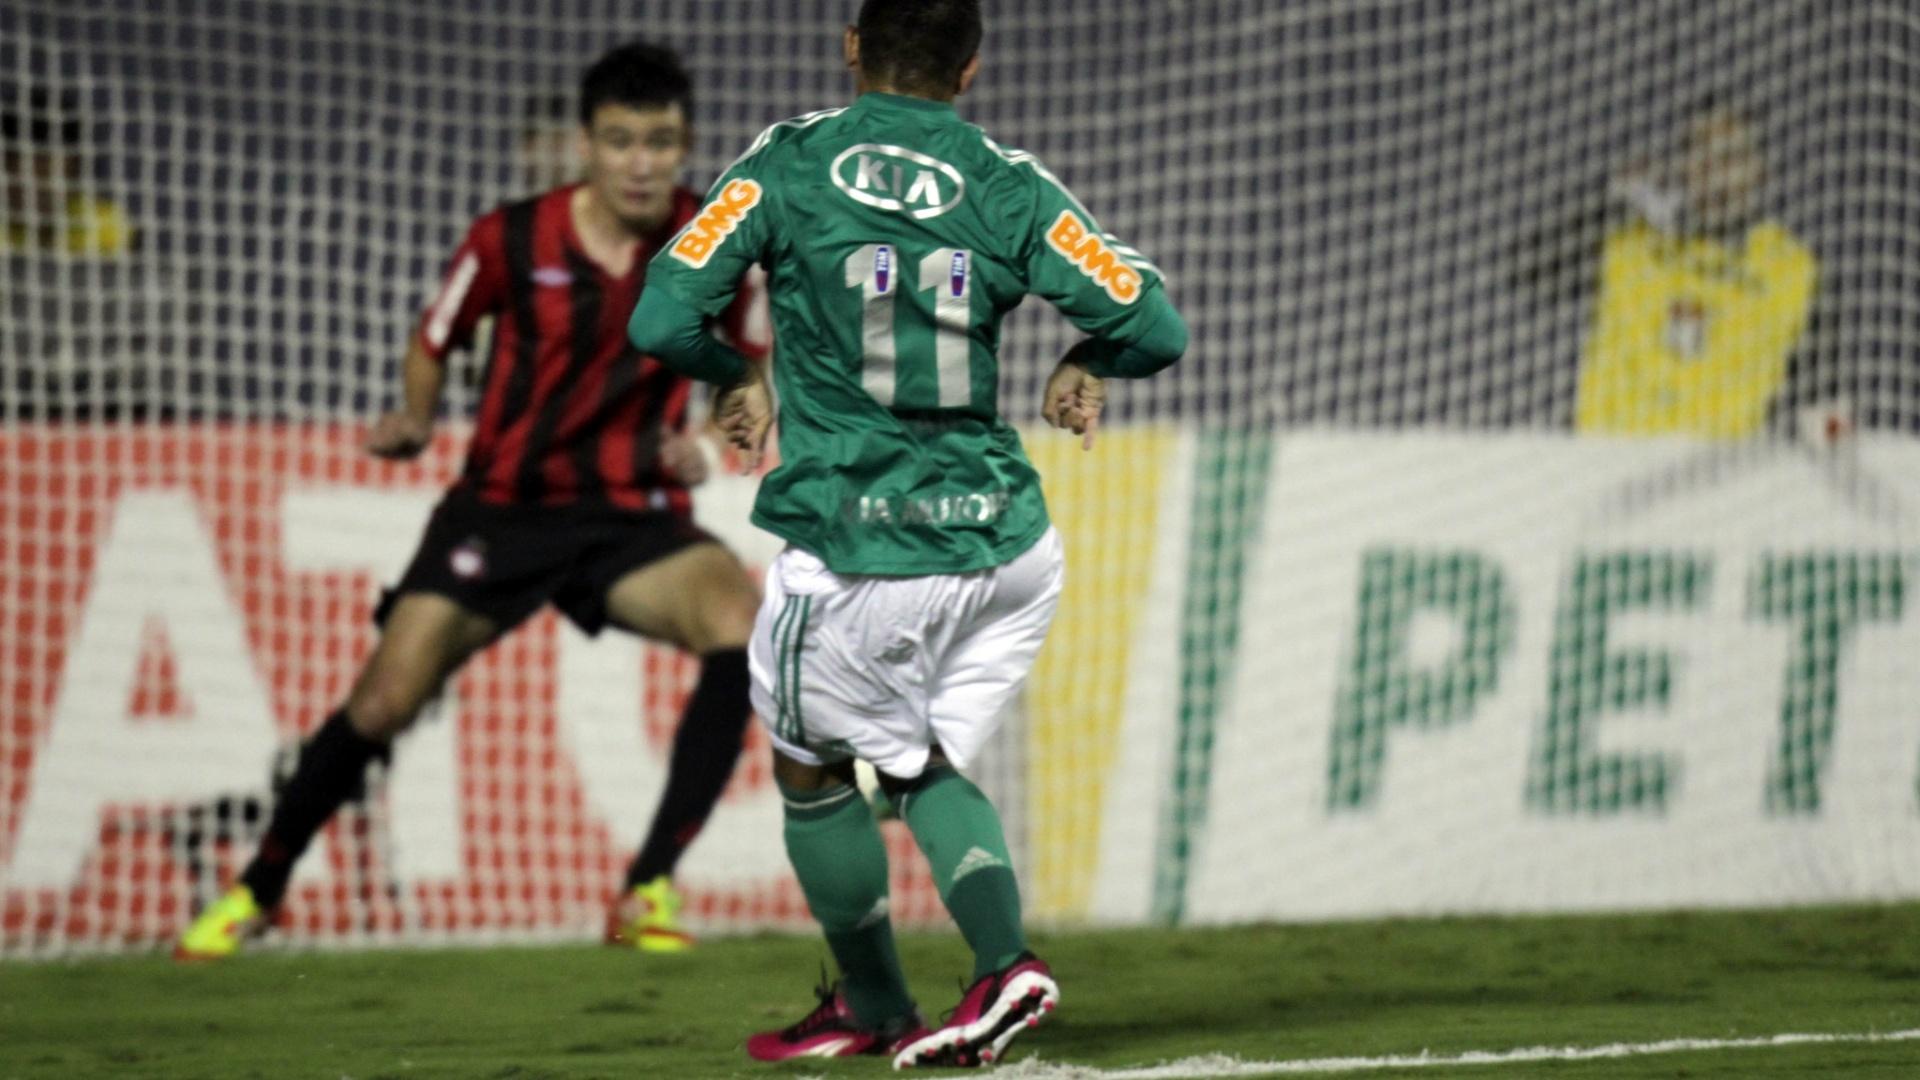 Luan chuta para marcar o primeiro gol do Palmeiras contra o Atlético-PR na Arena Barueri